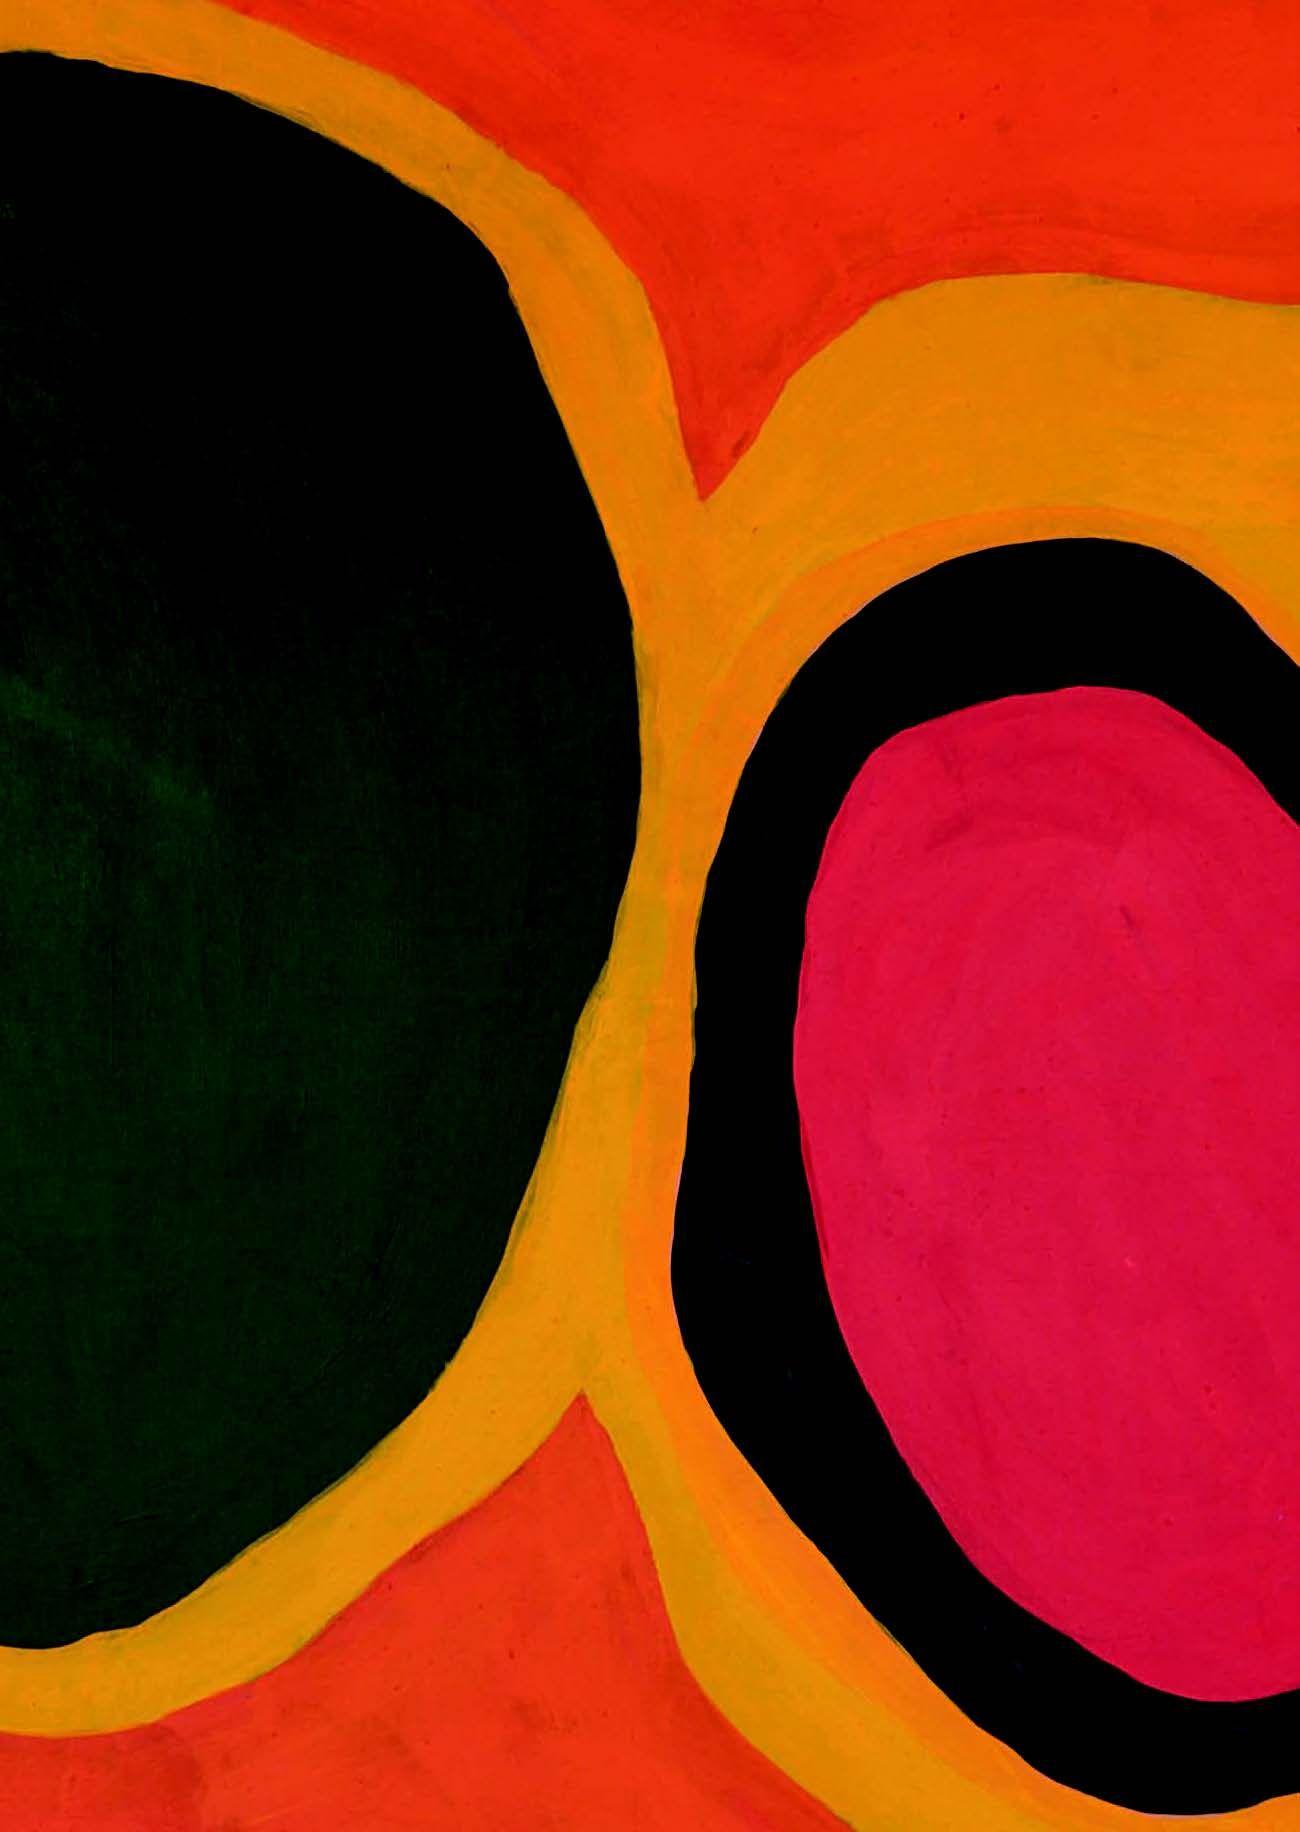 Jules Olitski Basium Blush 1960 Magna On Canvas 79 X 109 In 200 7 X 276 9 Cm Jules Olitski Colorful Art Lyrical Abstraction